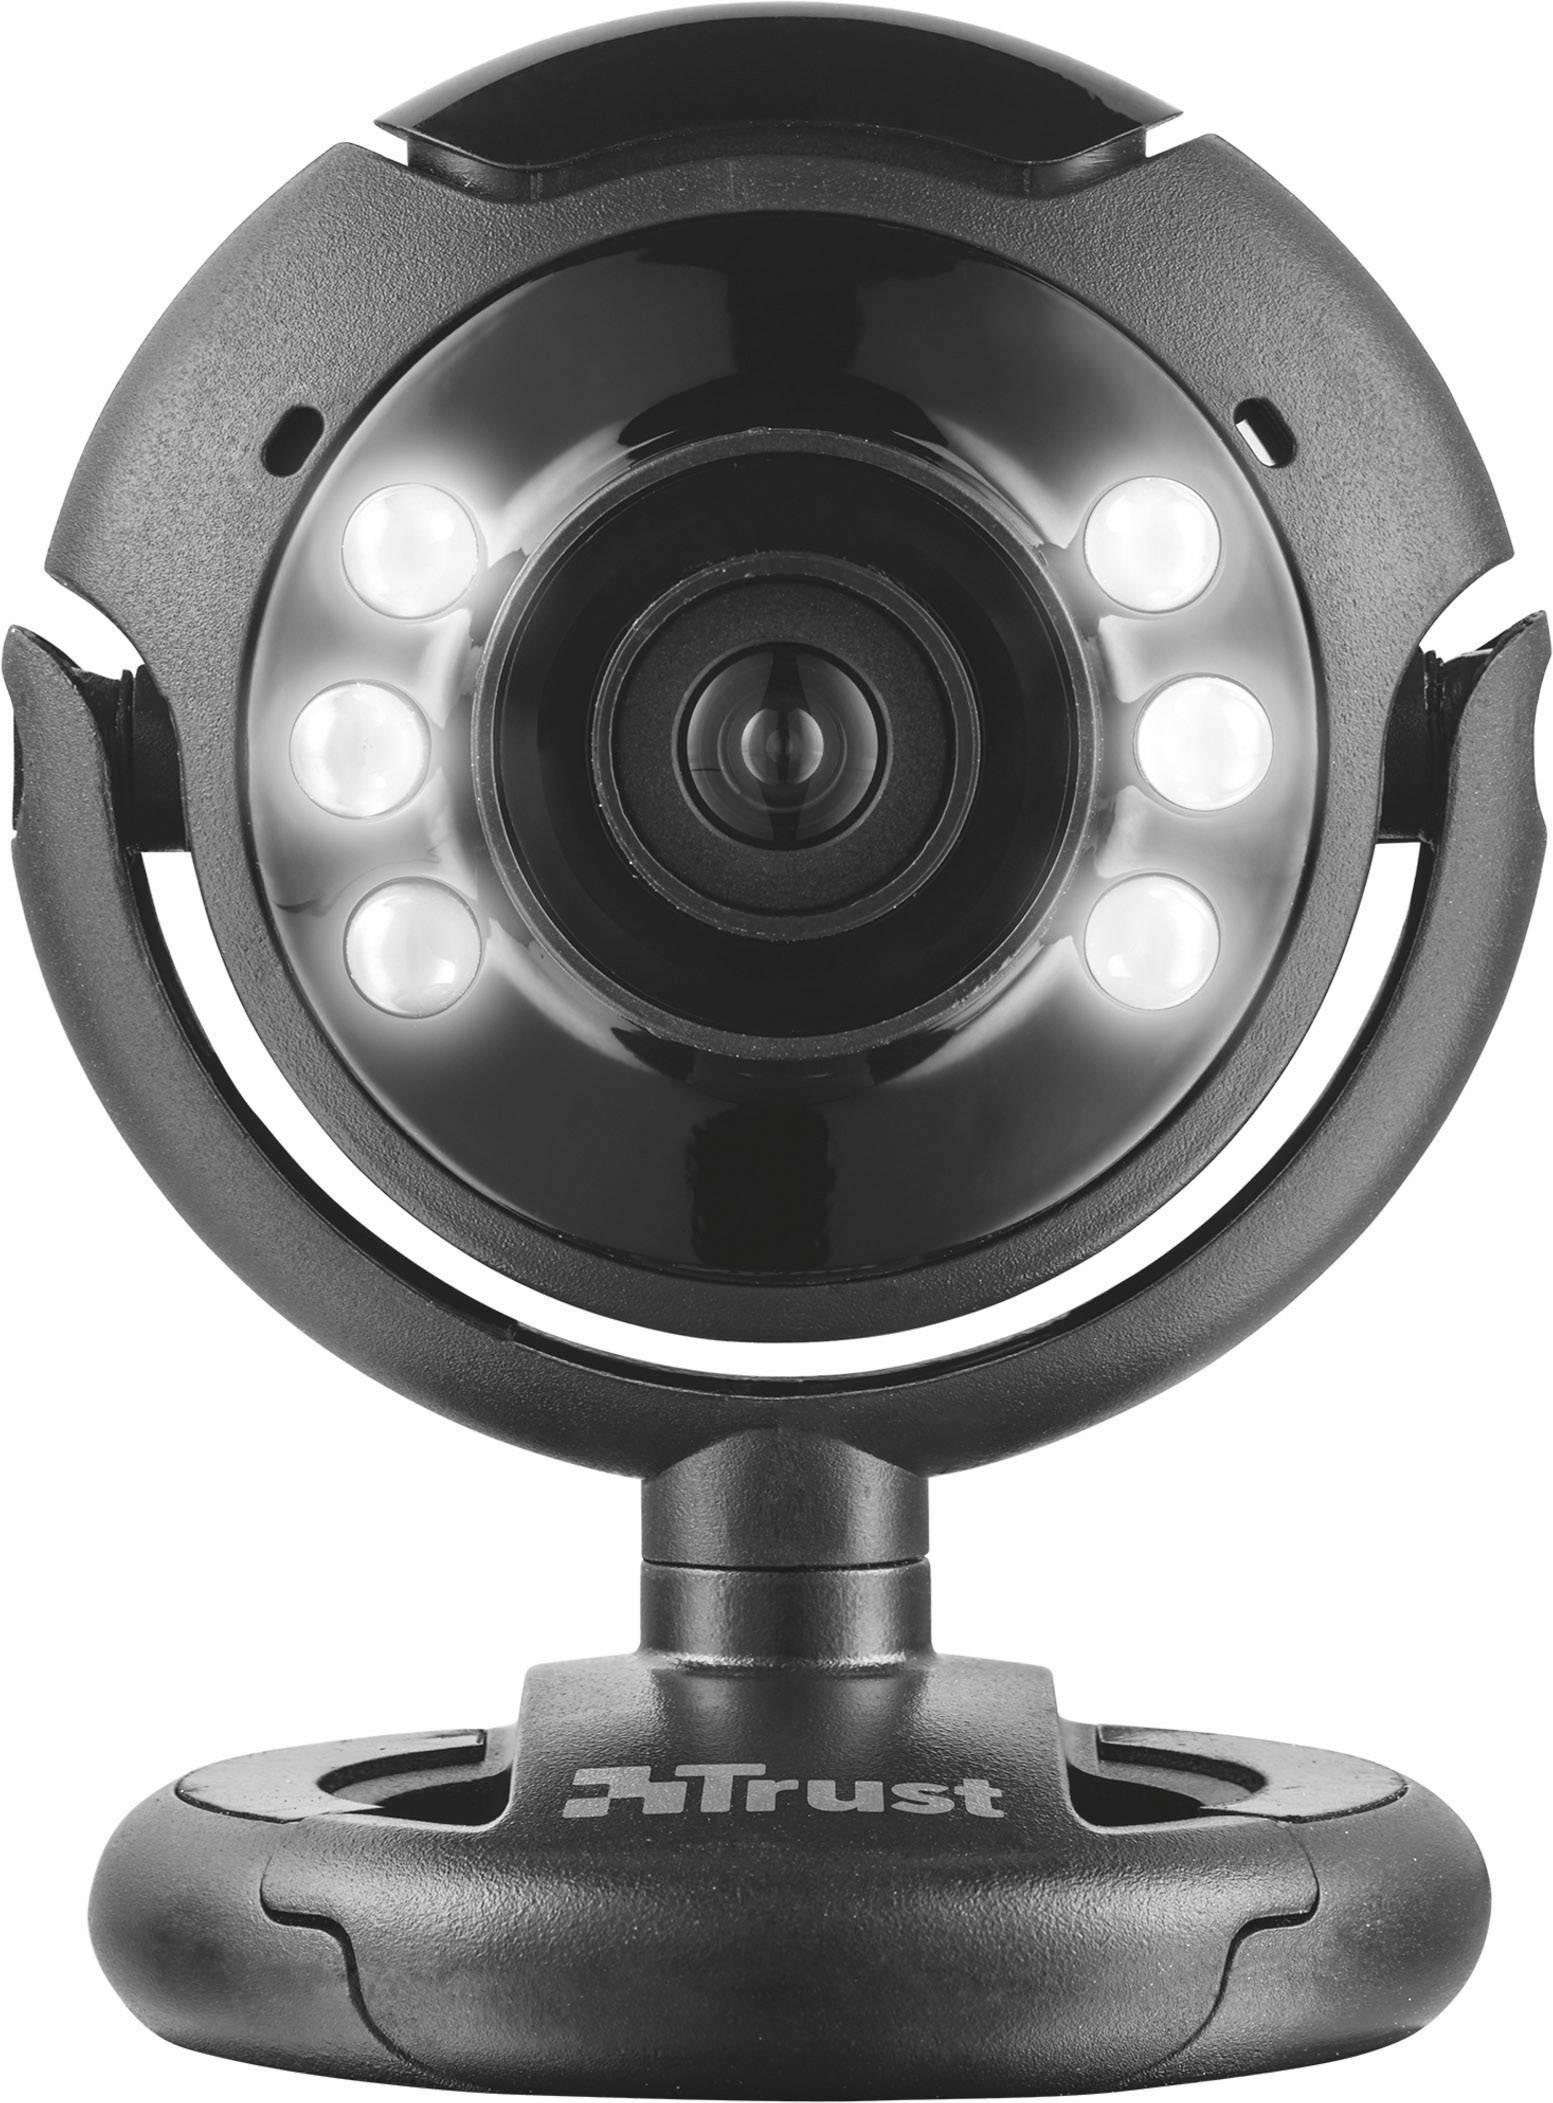 Webcam HD 1280 x 1024 Pixel Tr